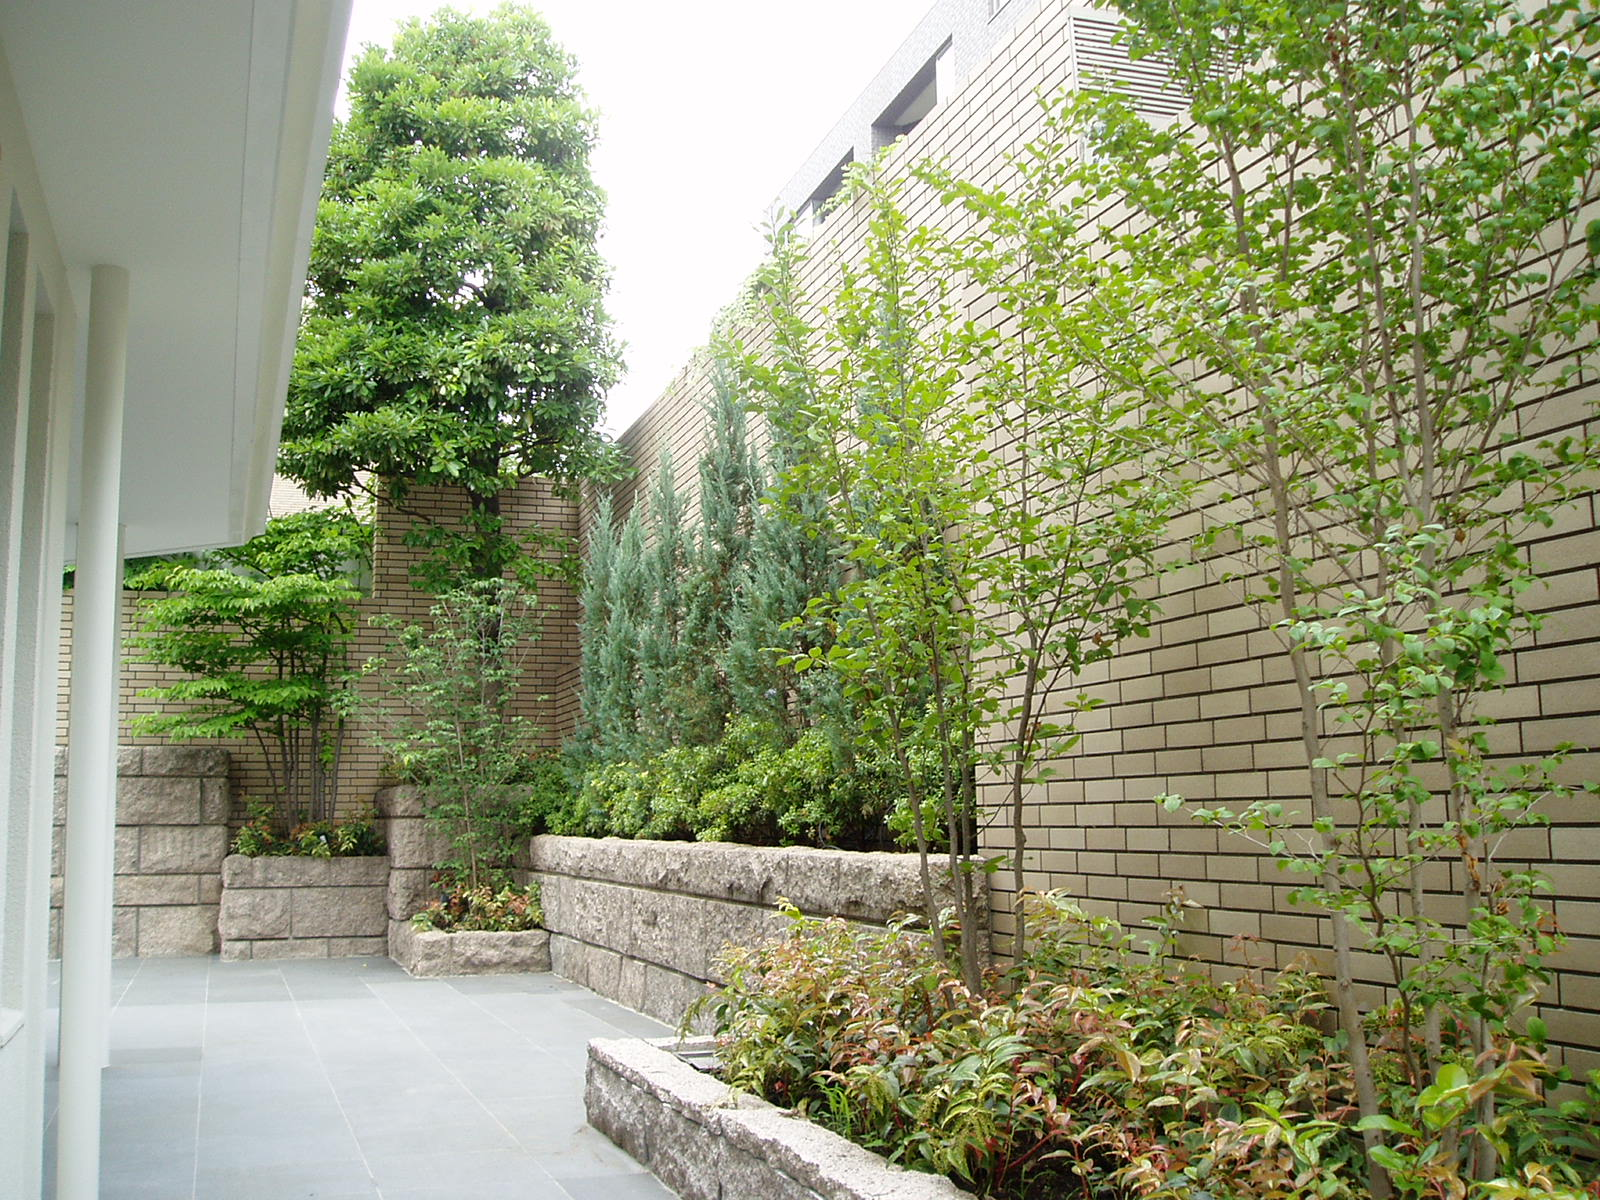 F邸(個人庭園)